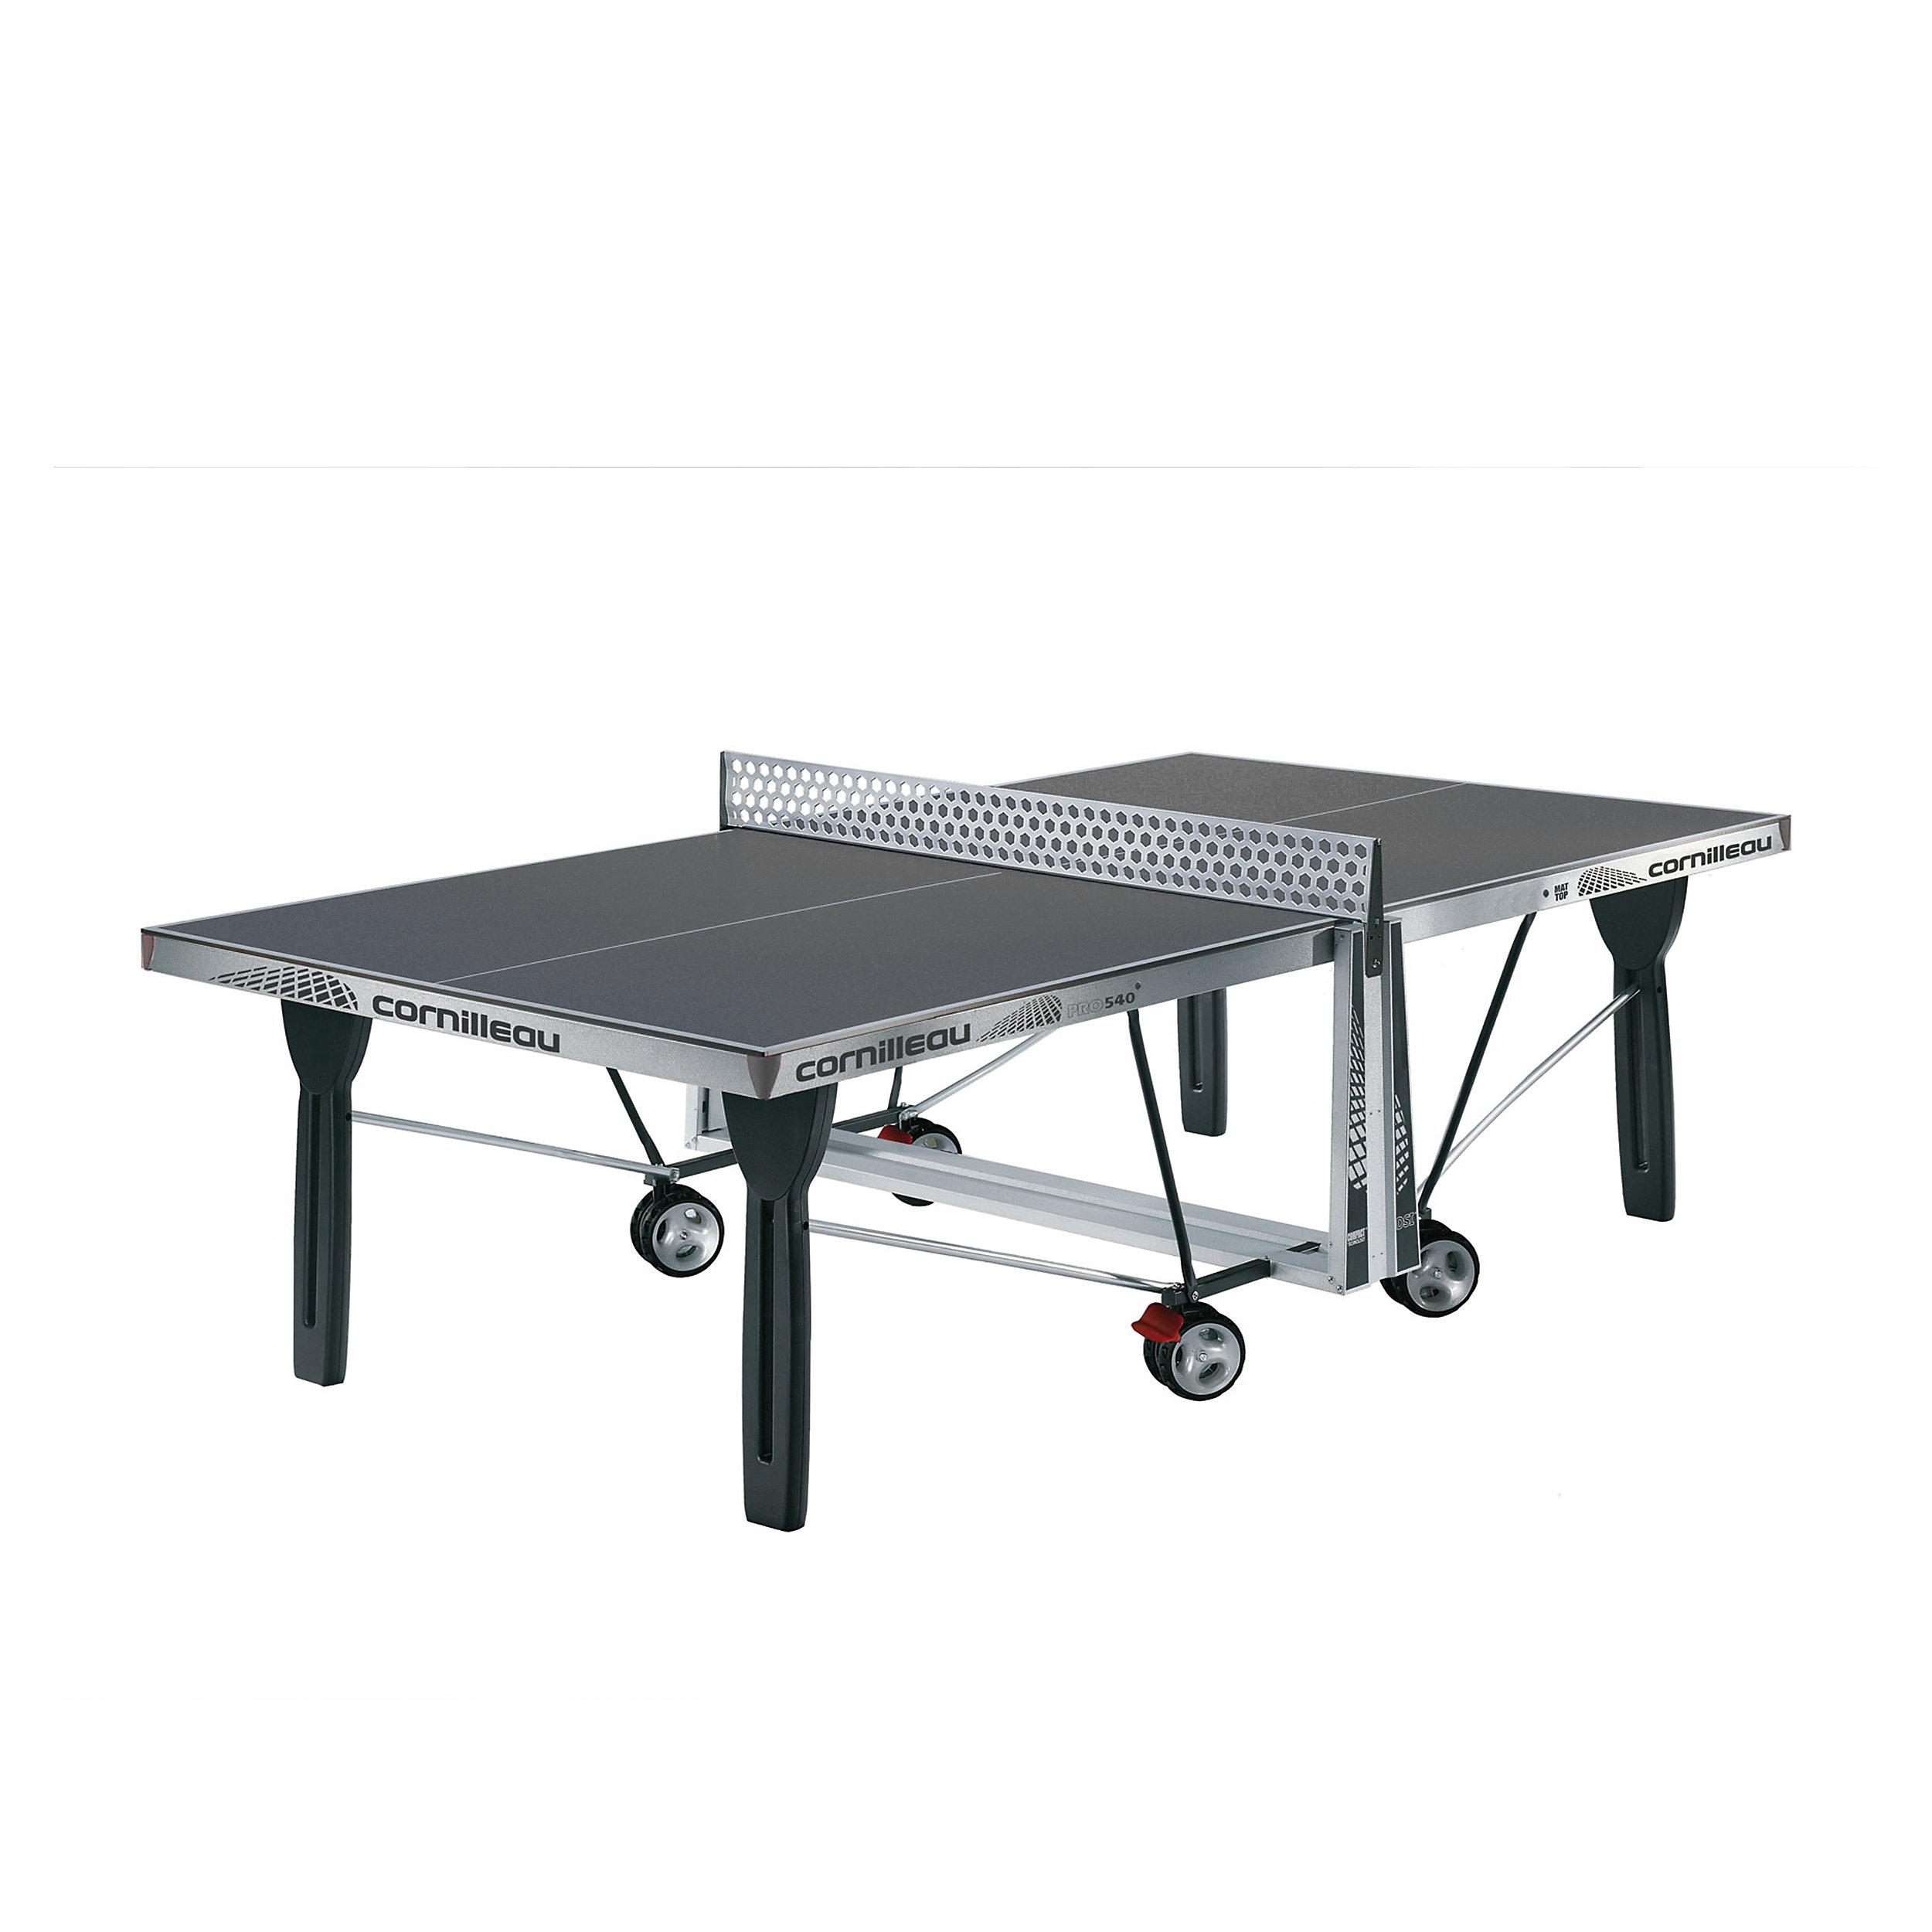 Cornilleau Pro 540   Ping Pong Table Outdoor   Billiard Factory b7066f5271e3